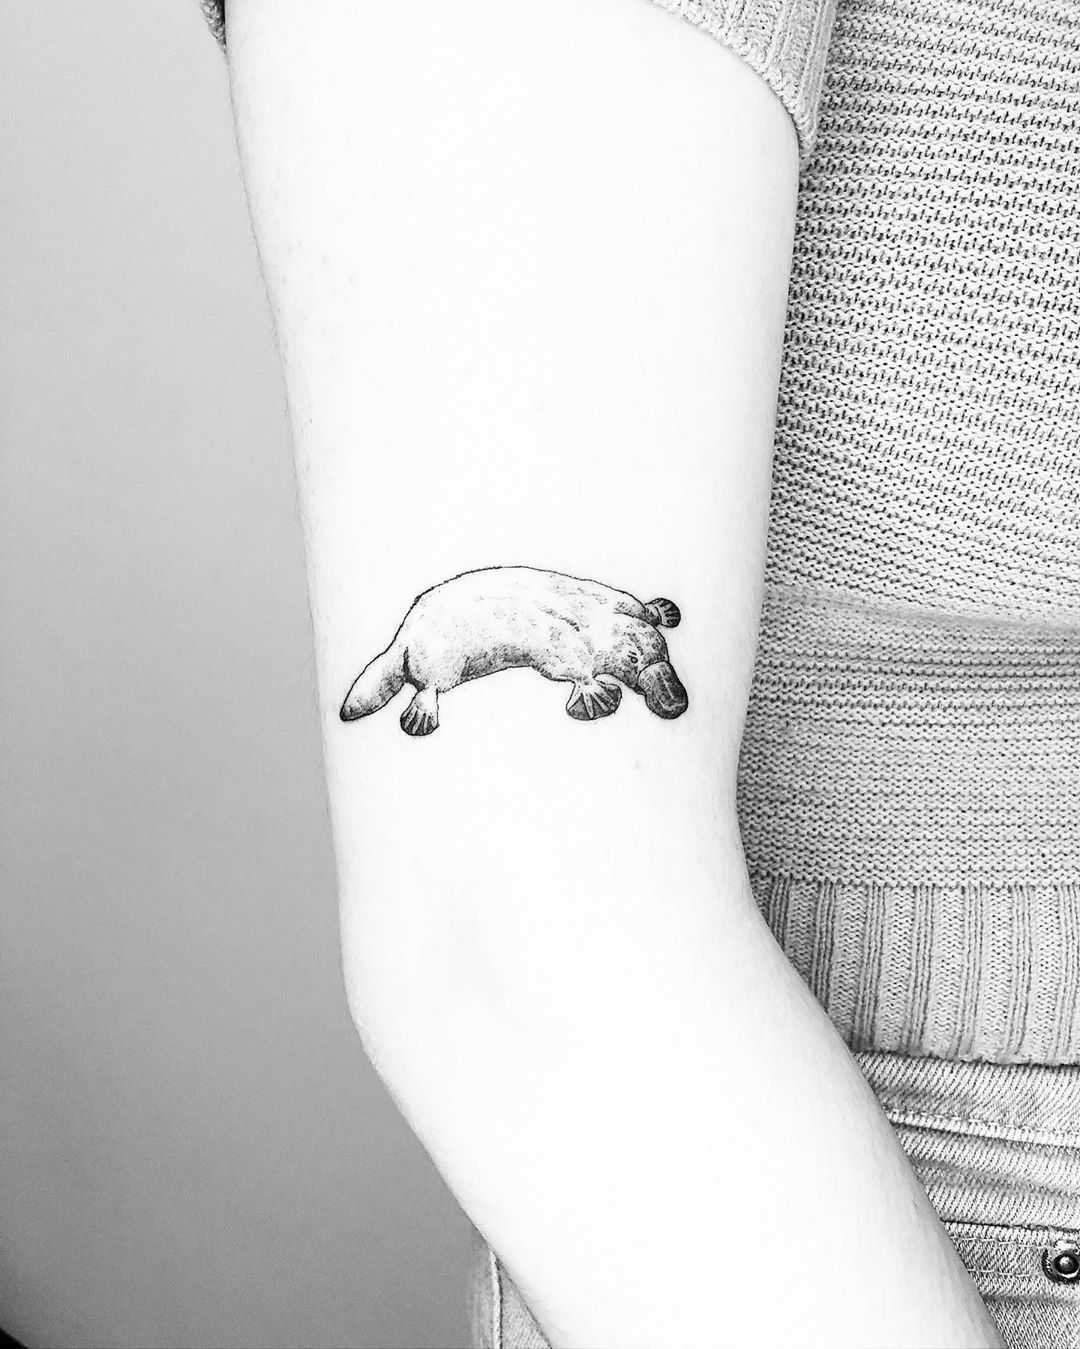 Platypus tattoo by Jake Harry Ditchfield